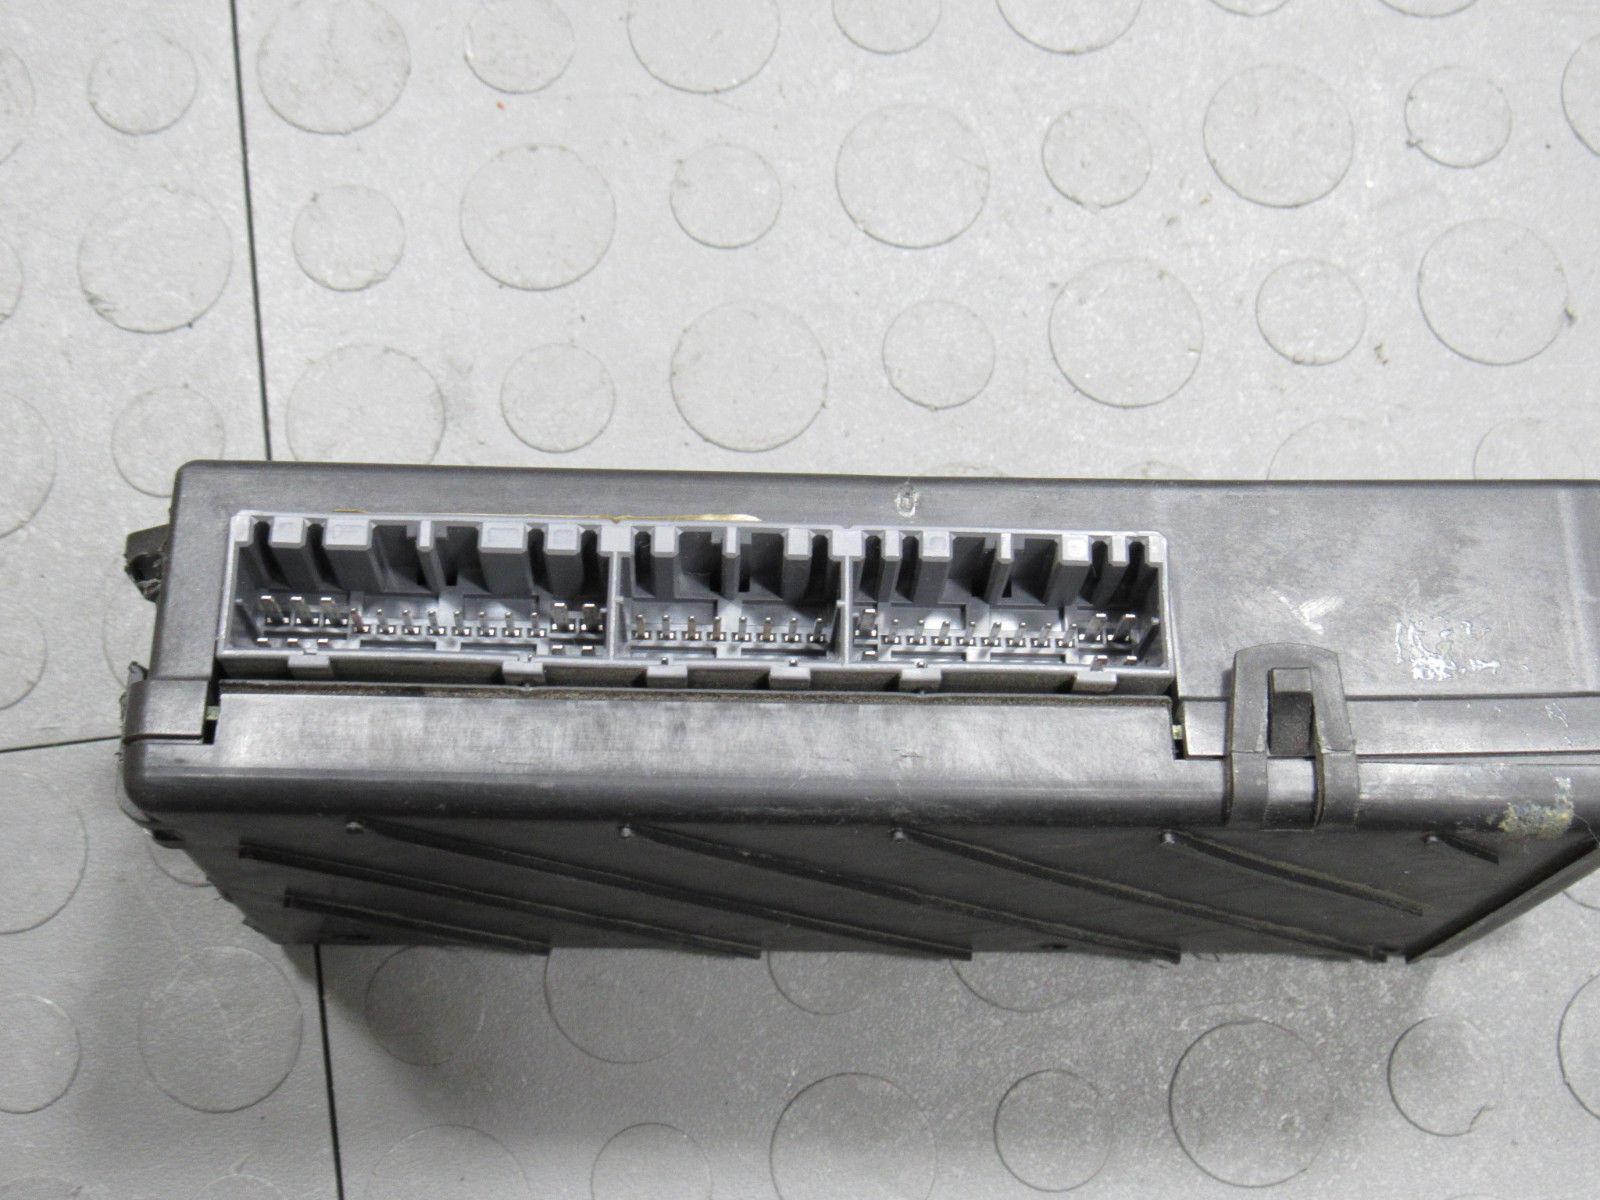 00 Ford Excursion Bcm Gem Multifunction Control Module Unit Yc3t Fuse Box For Sale 14b205 Ce P